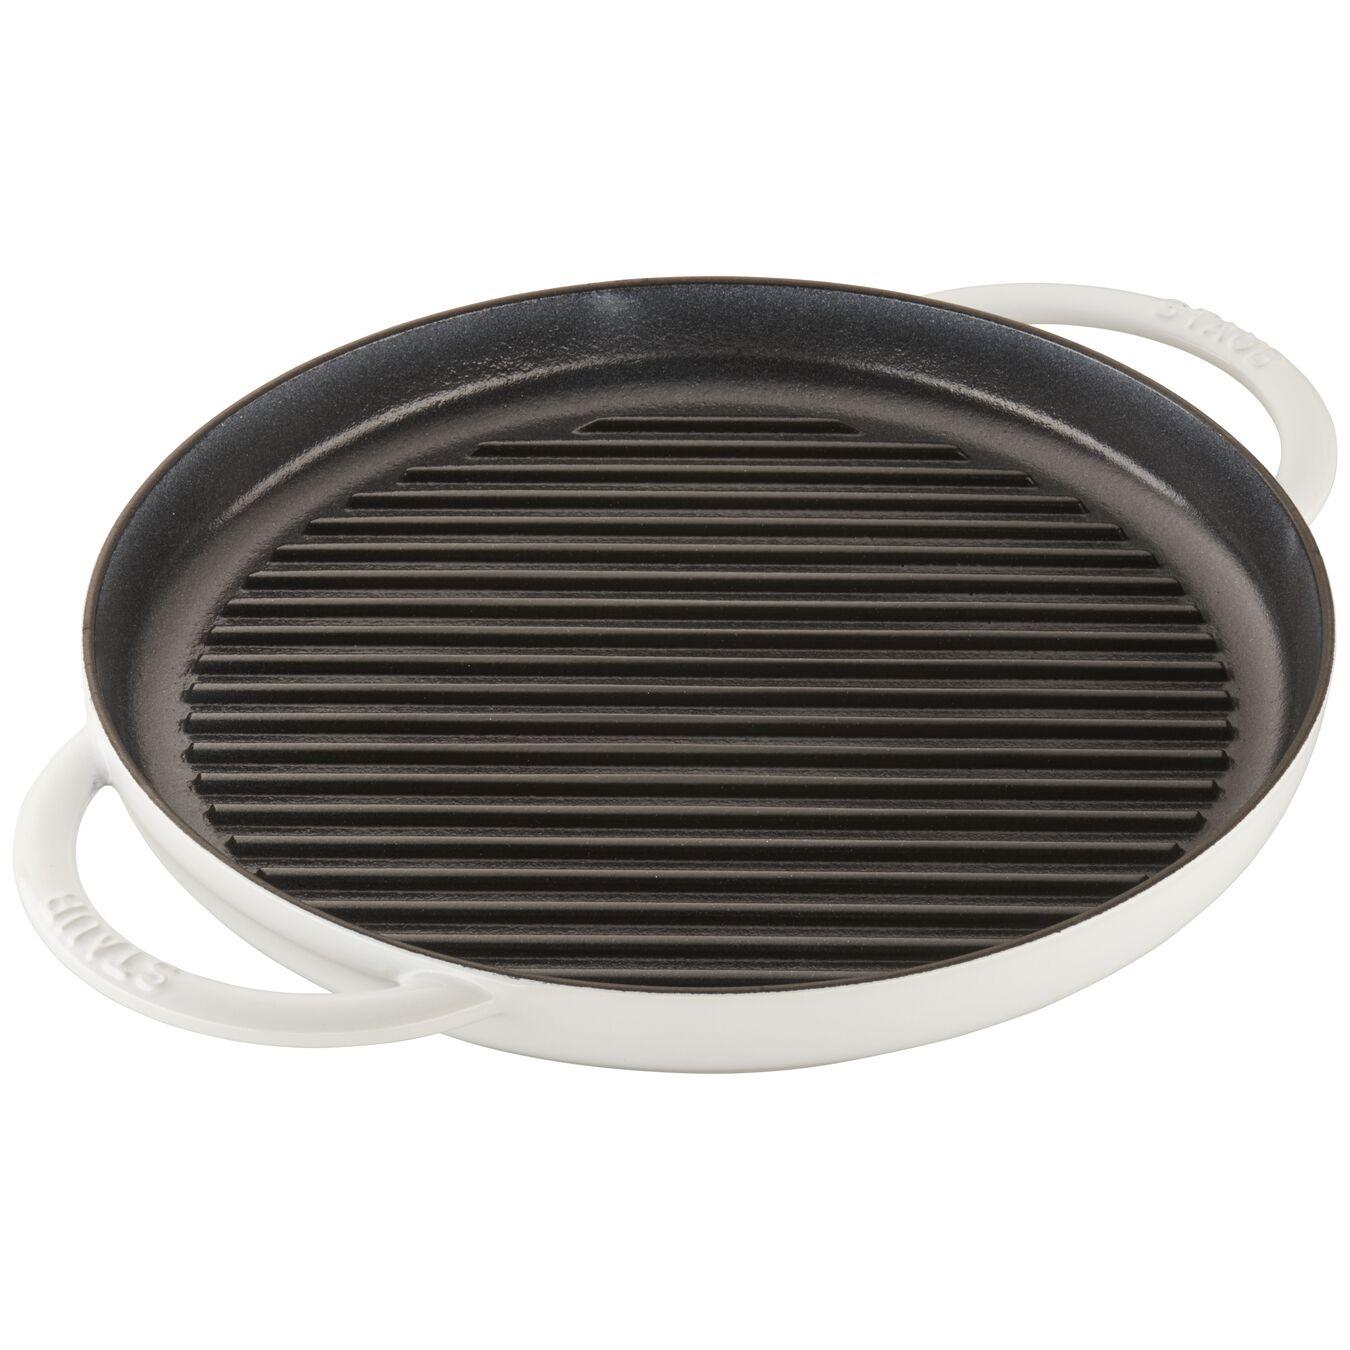 12-inch Round Steam Grill - White,,large 3